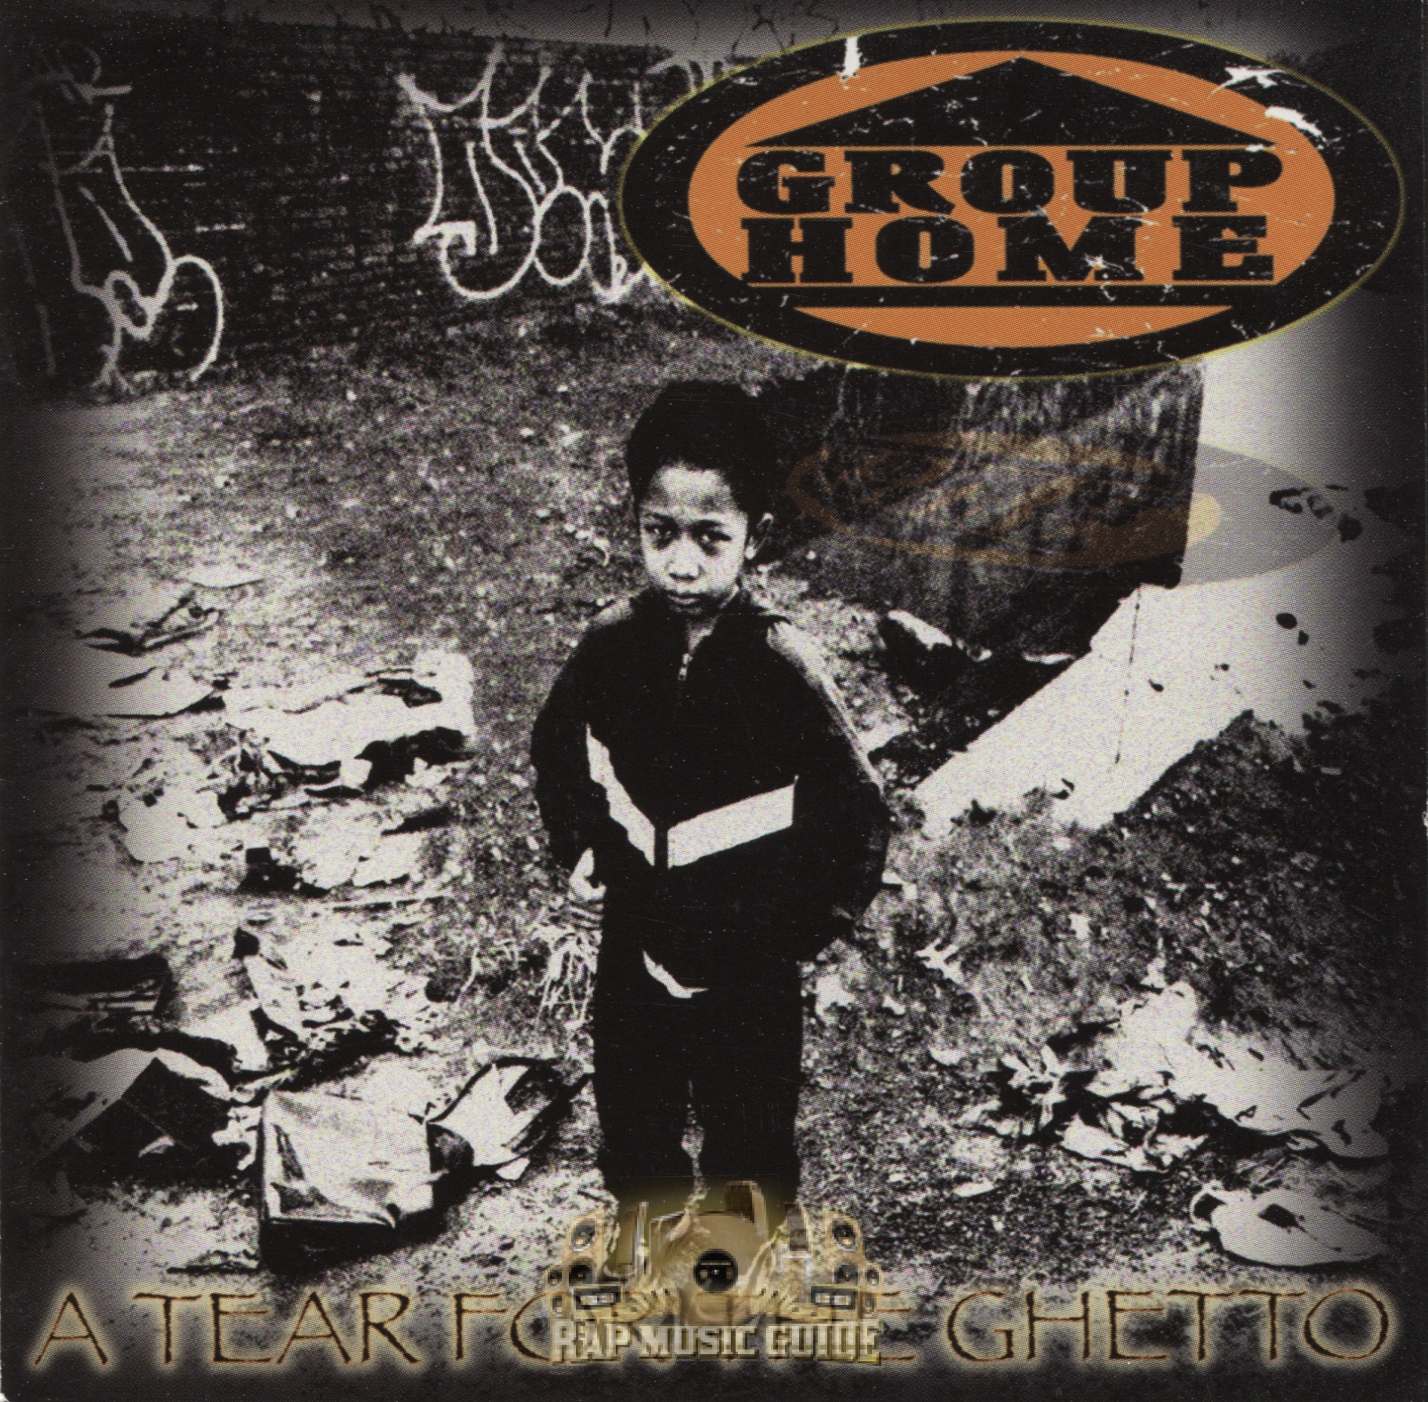 Group Home - A Tear For The Ghetto: CD